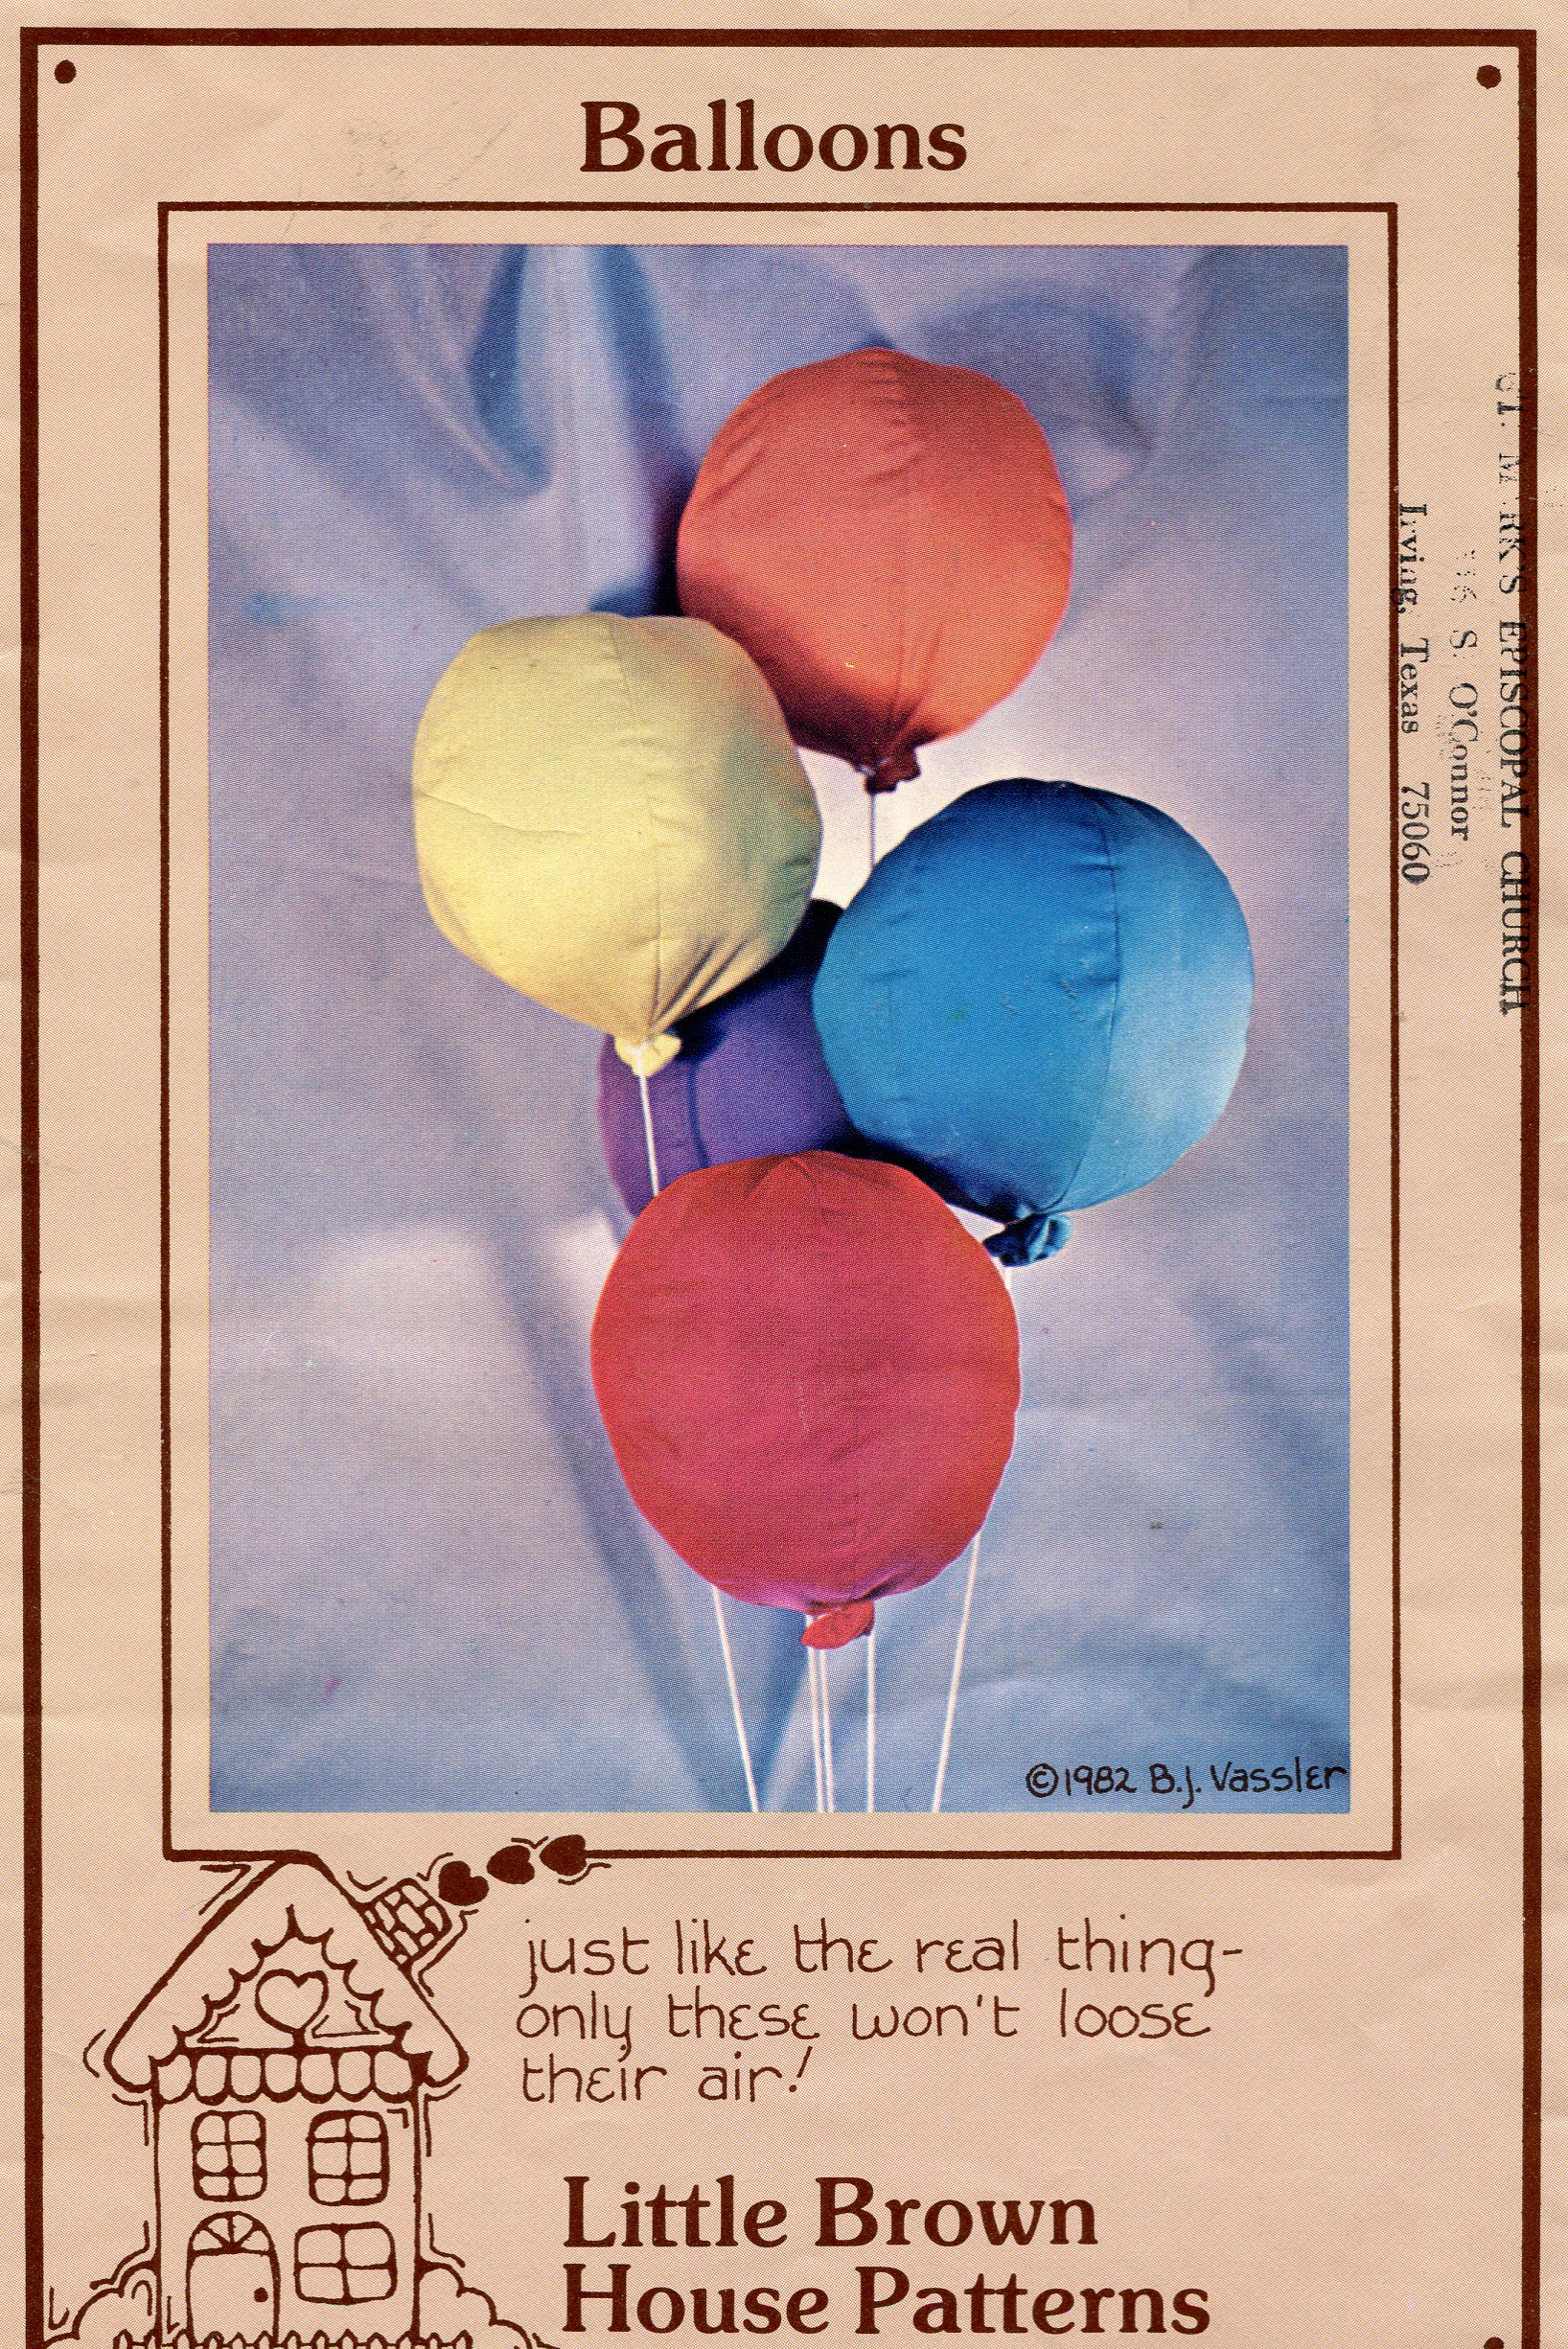 Little Brown House Balloons